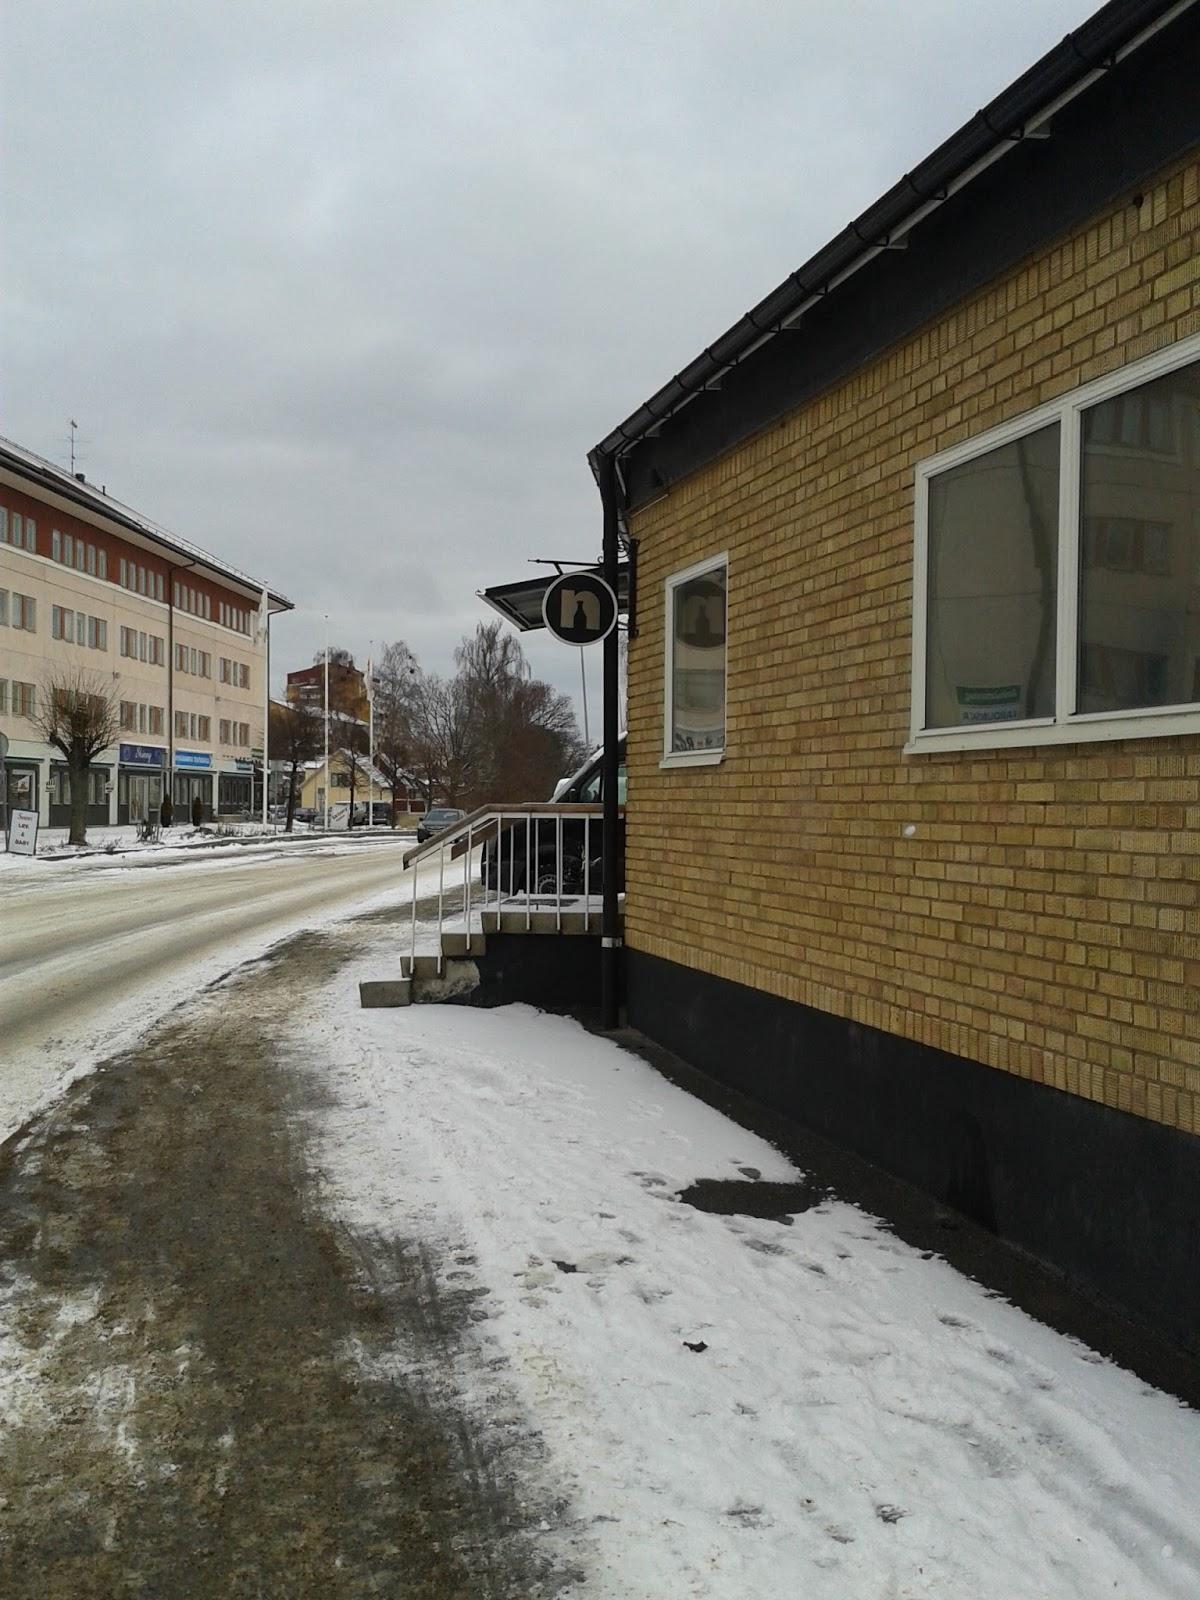 pris pendeltåg stockholm nynäshamn